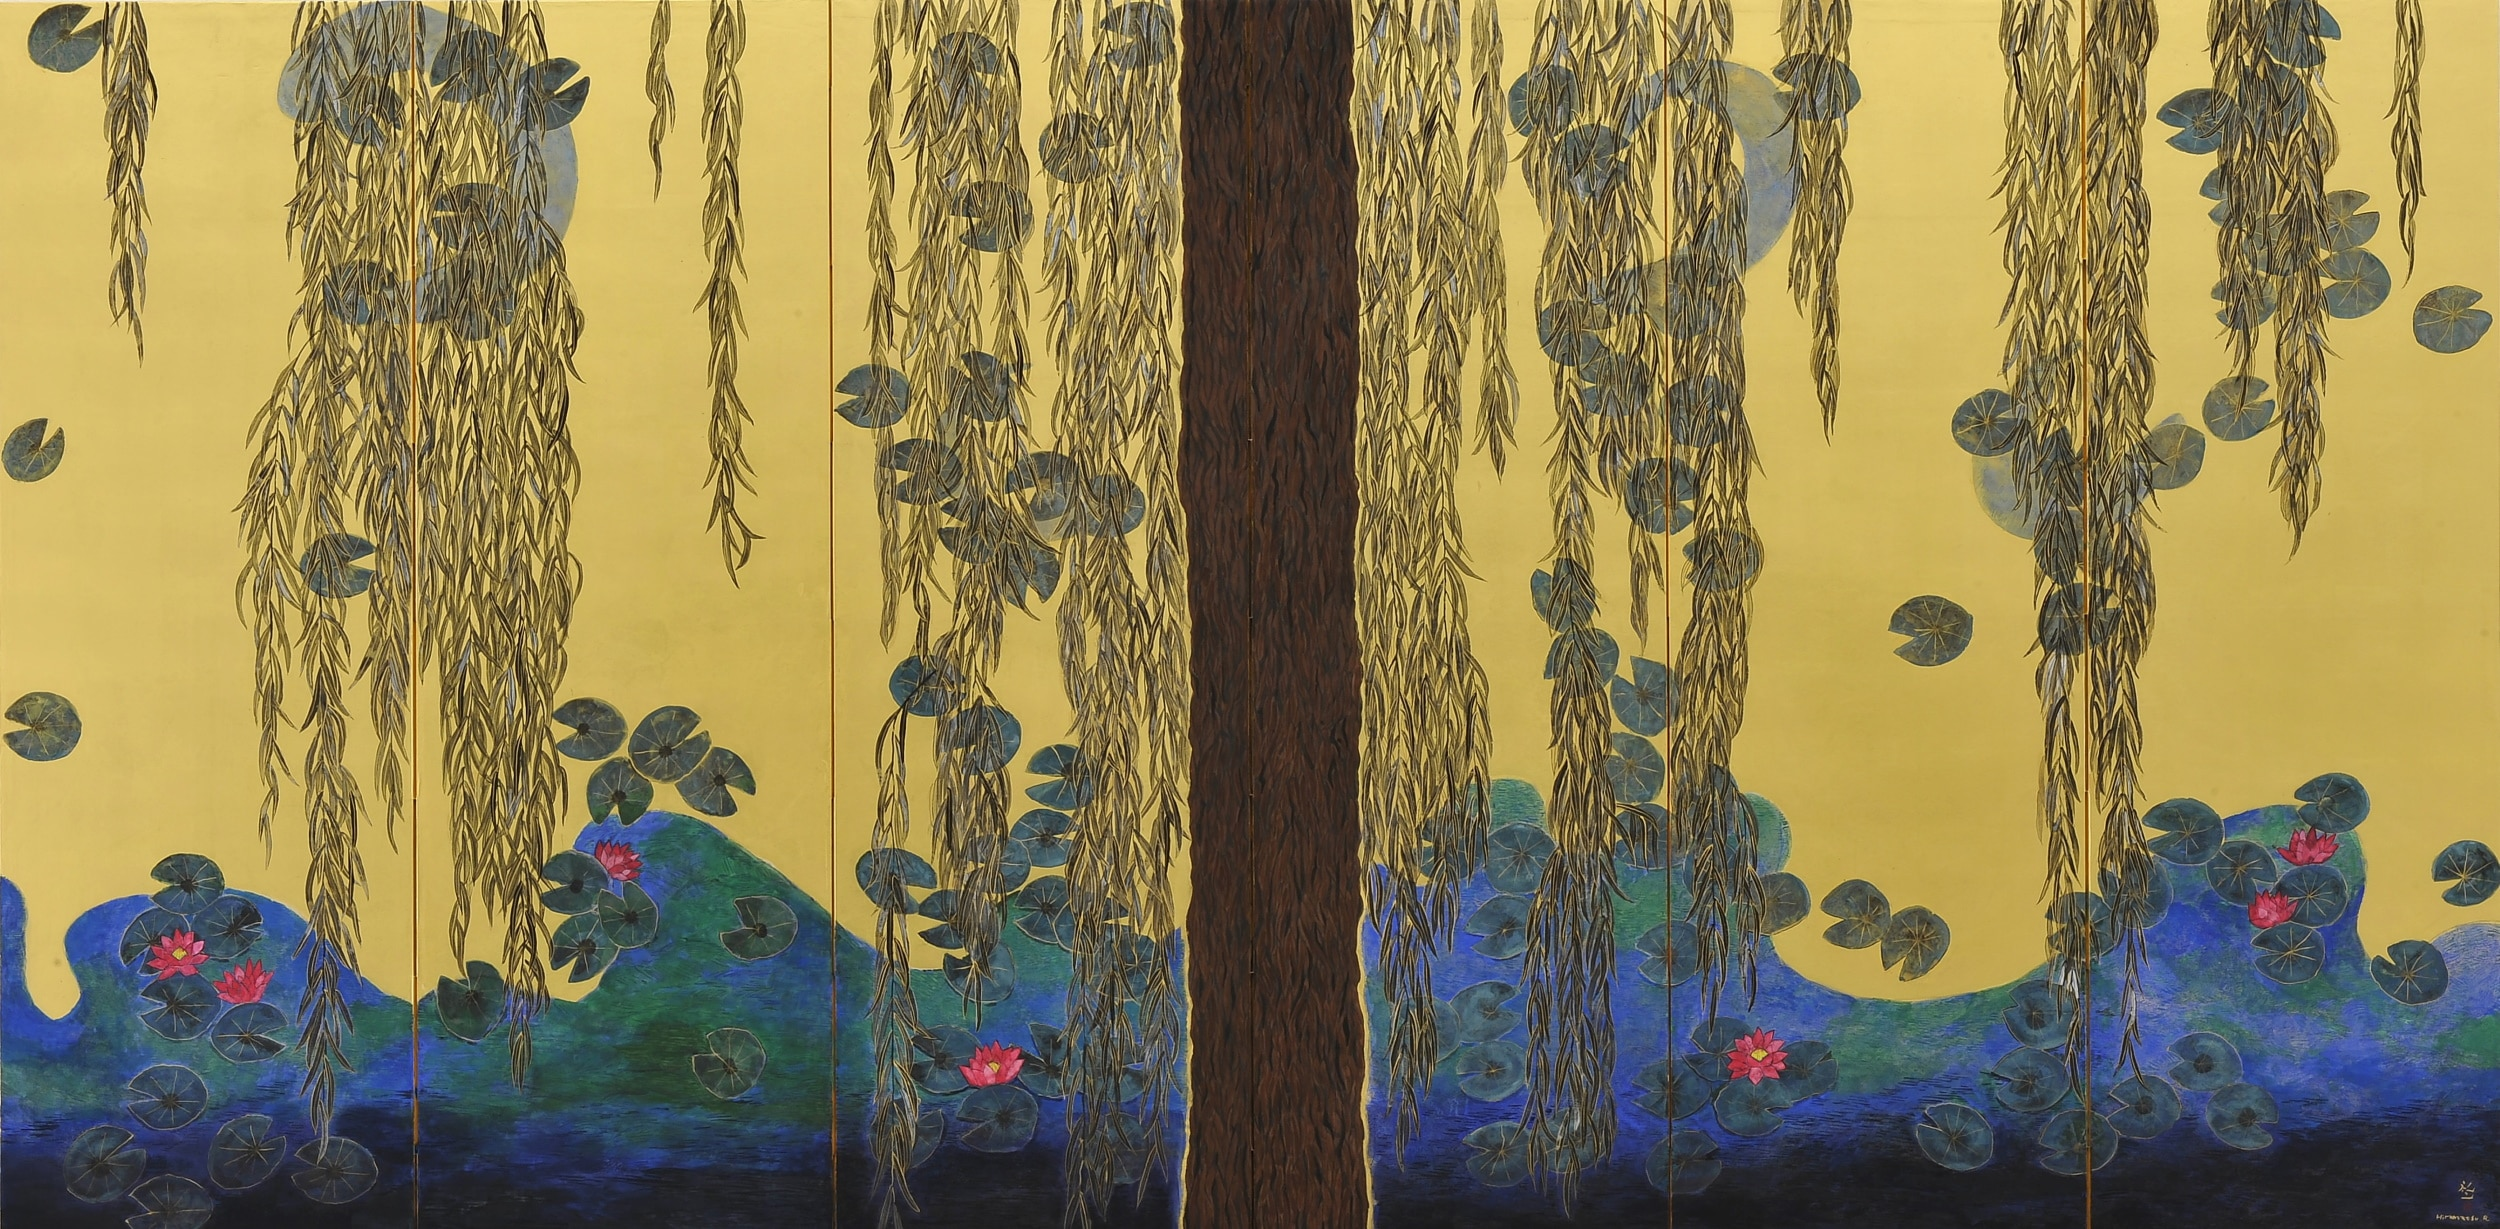 Hiramatsu Reiji, Giverny, l'étang de Monet ; brise légère